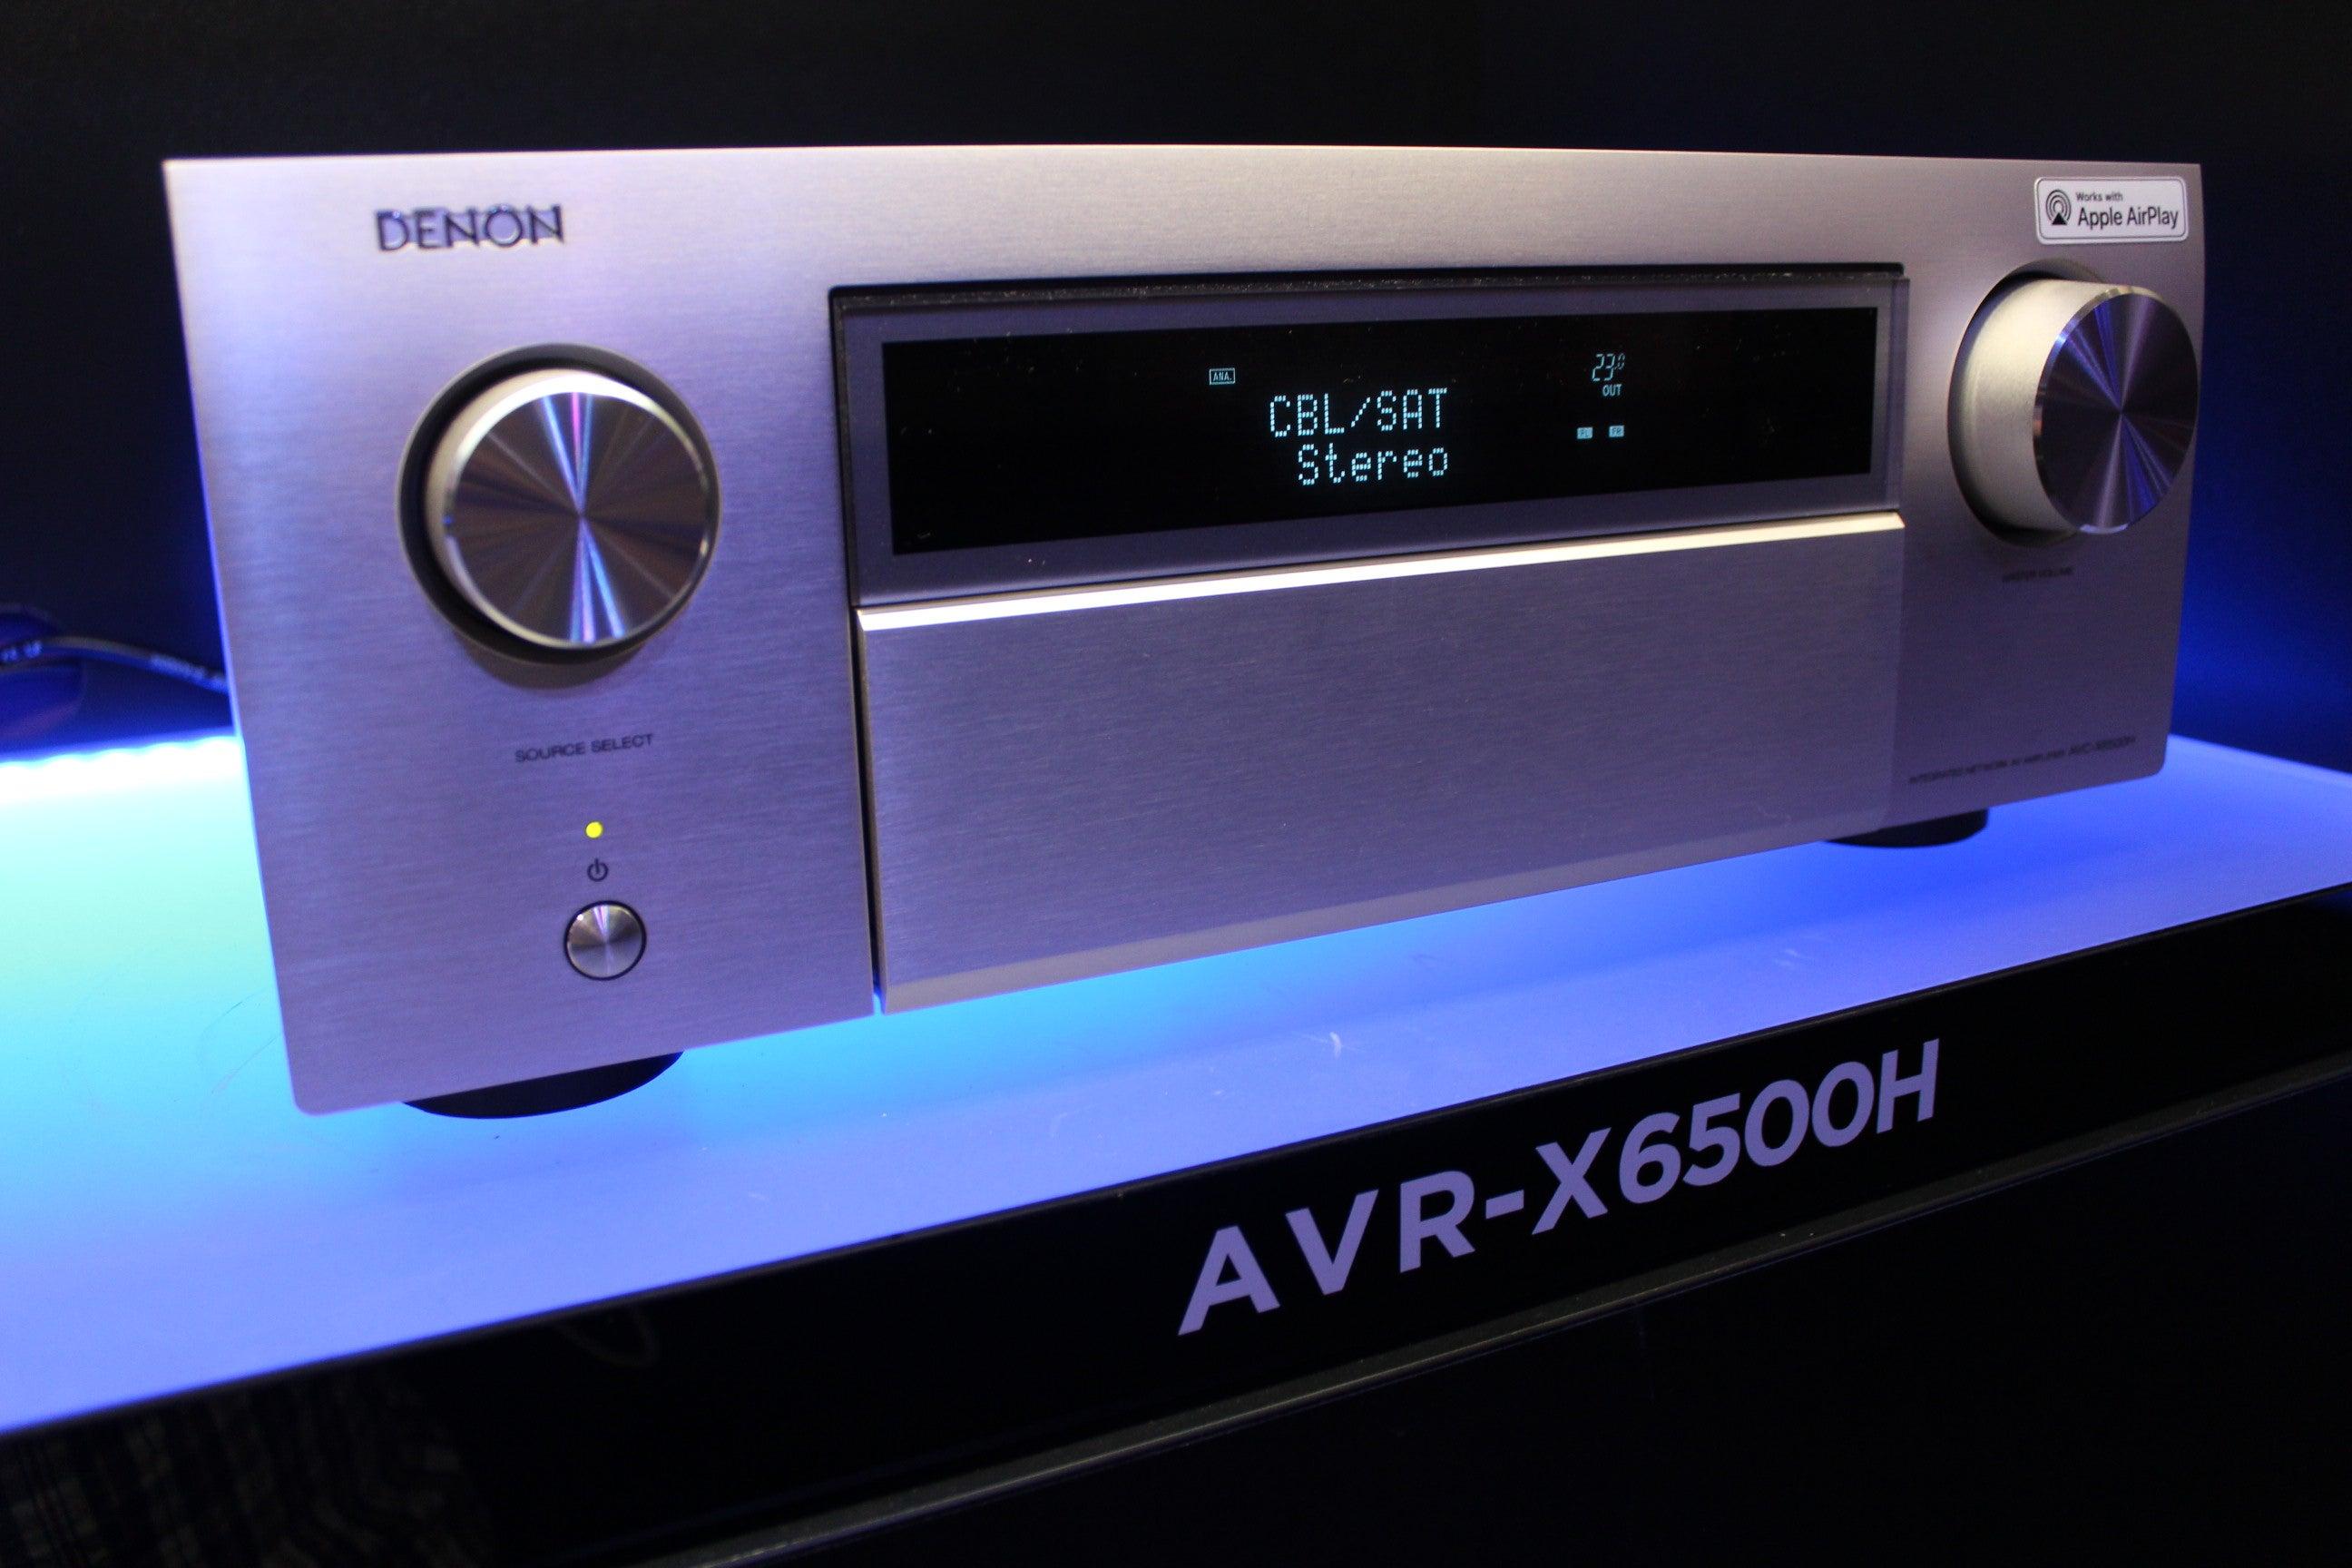 Denon's 2018 AV receivers add Amazon Alexa and Apple AirPlay